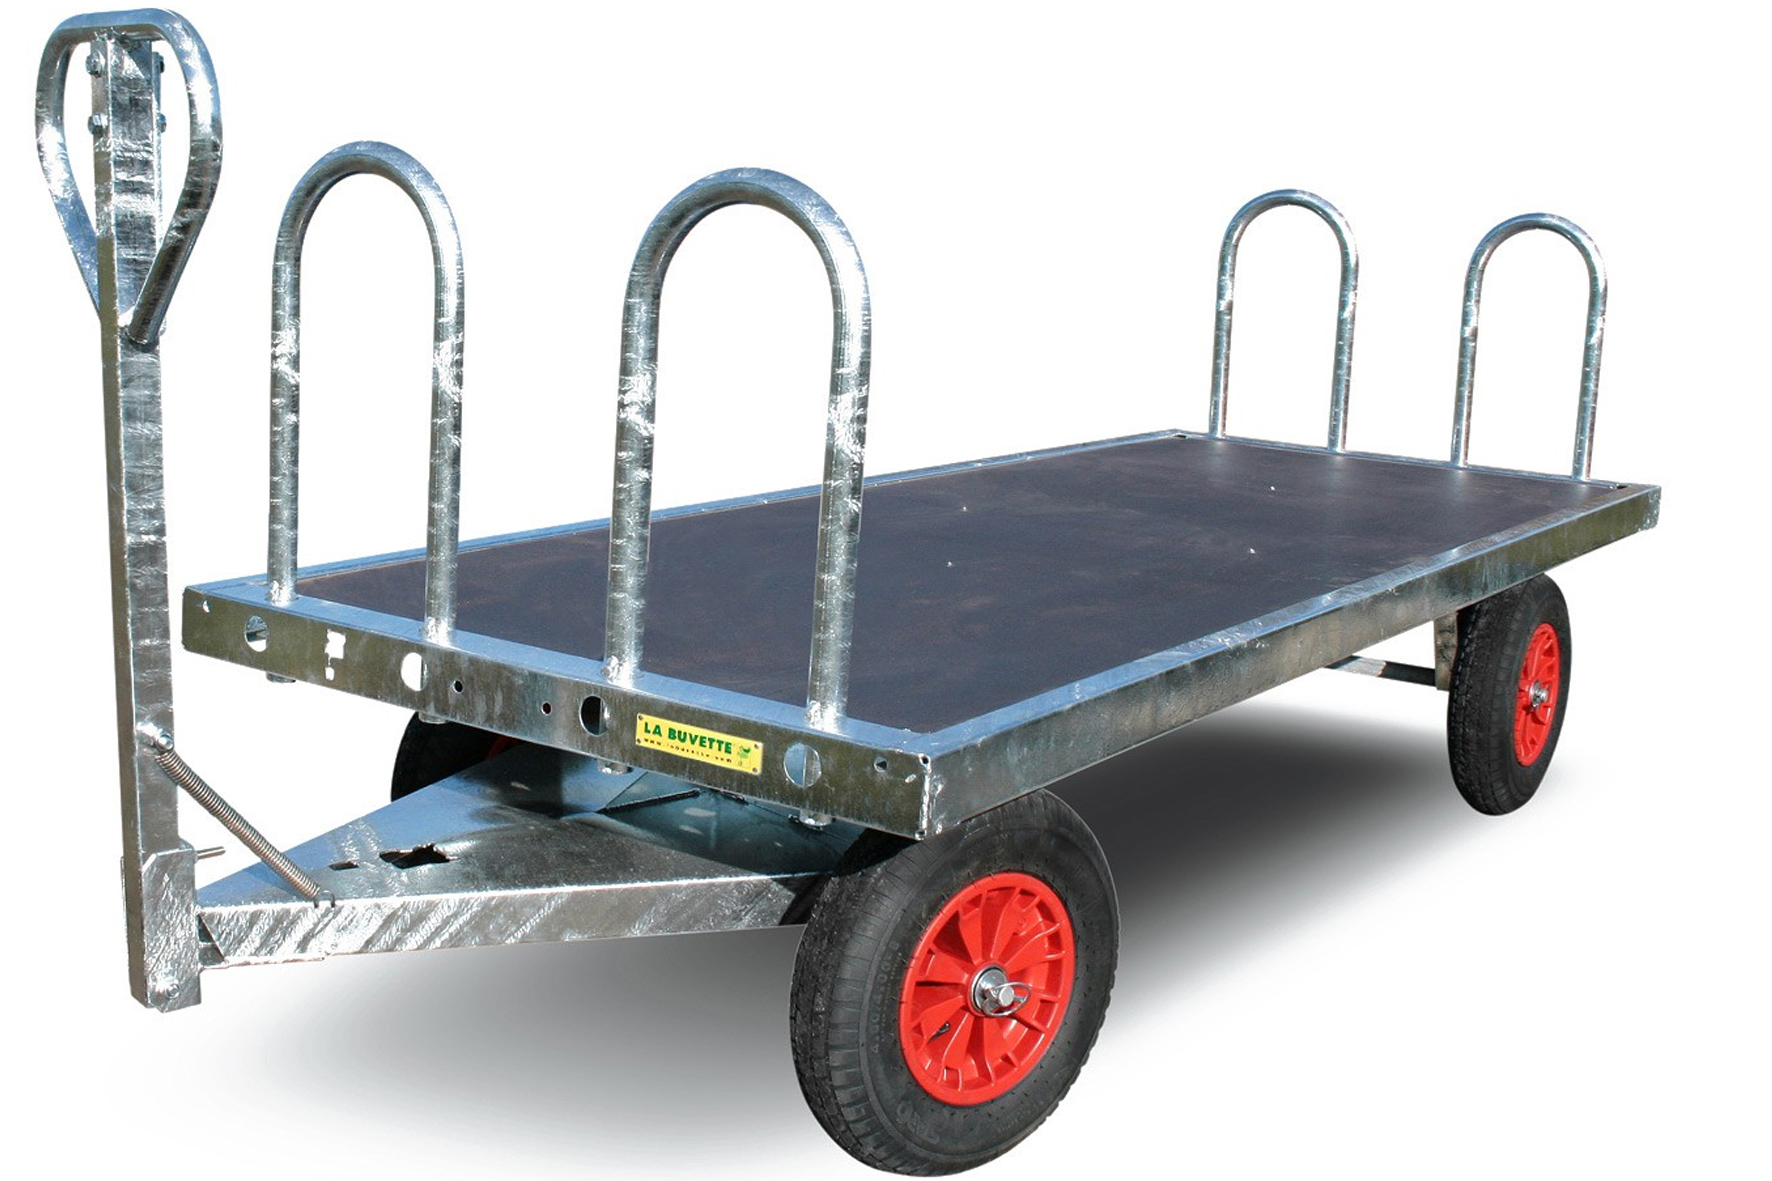 chariot plateau achat en ligne ou dans notre magasin. Black Bedroom Furniture Sets. Home Design Ideas